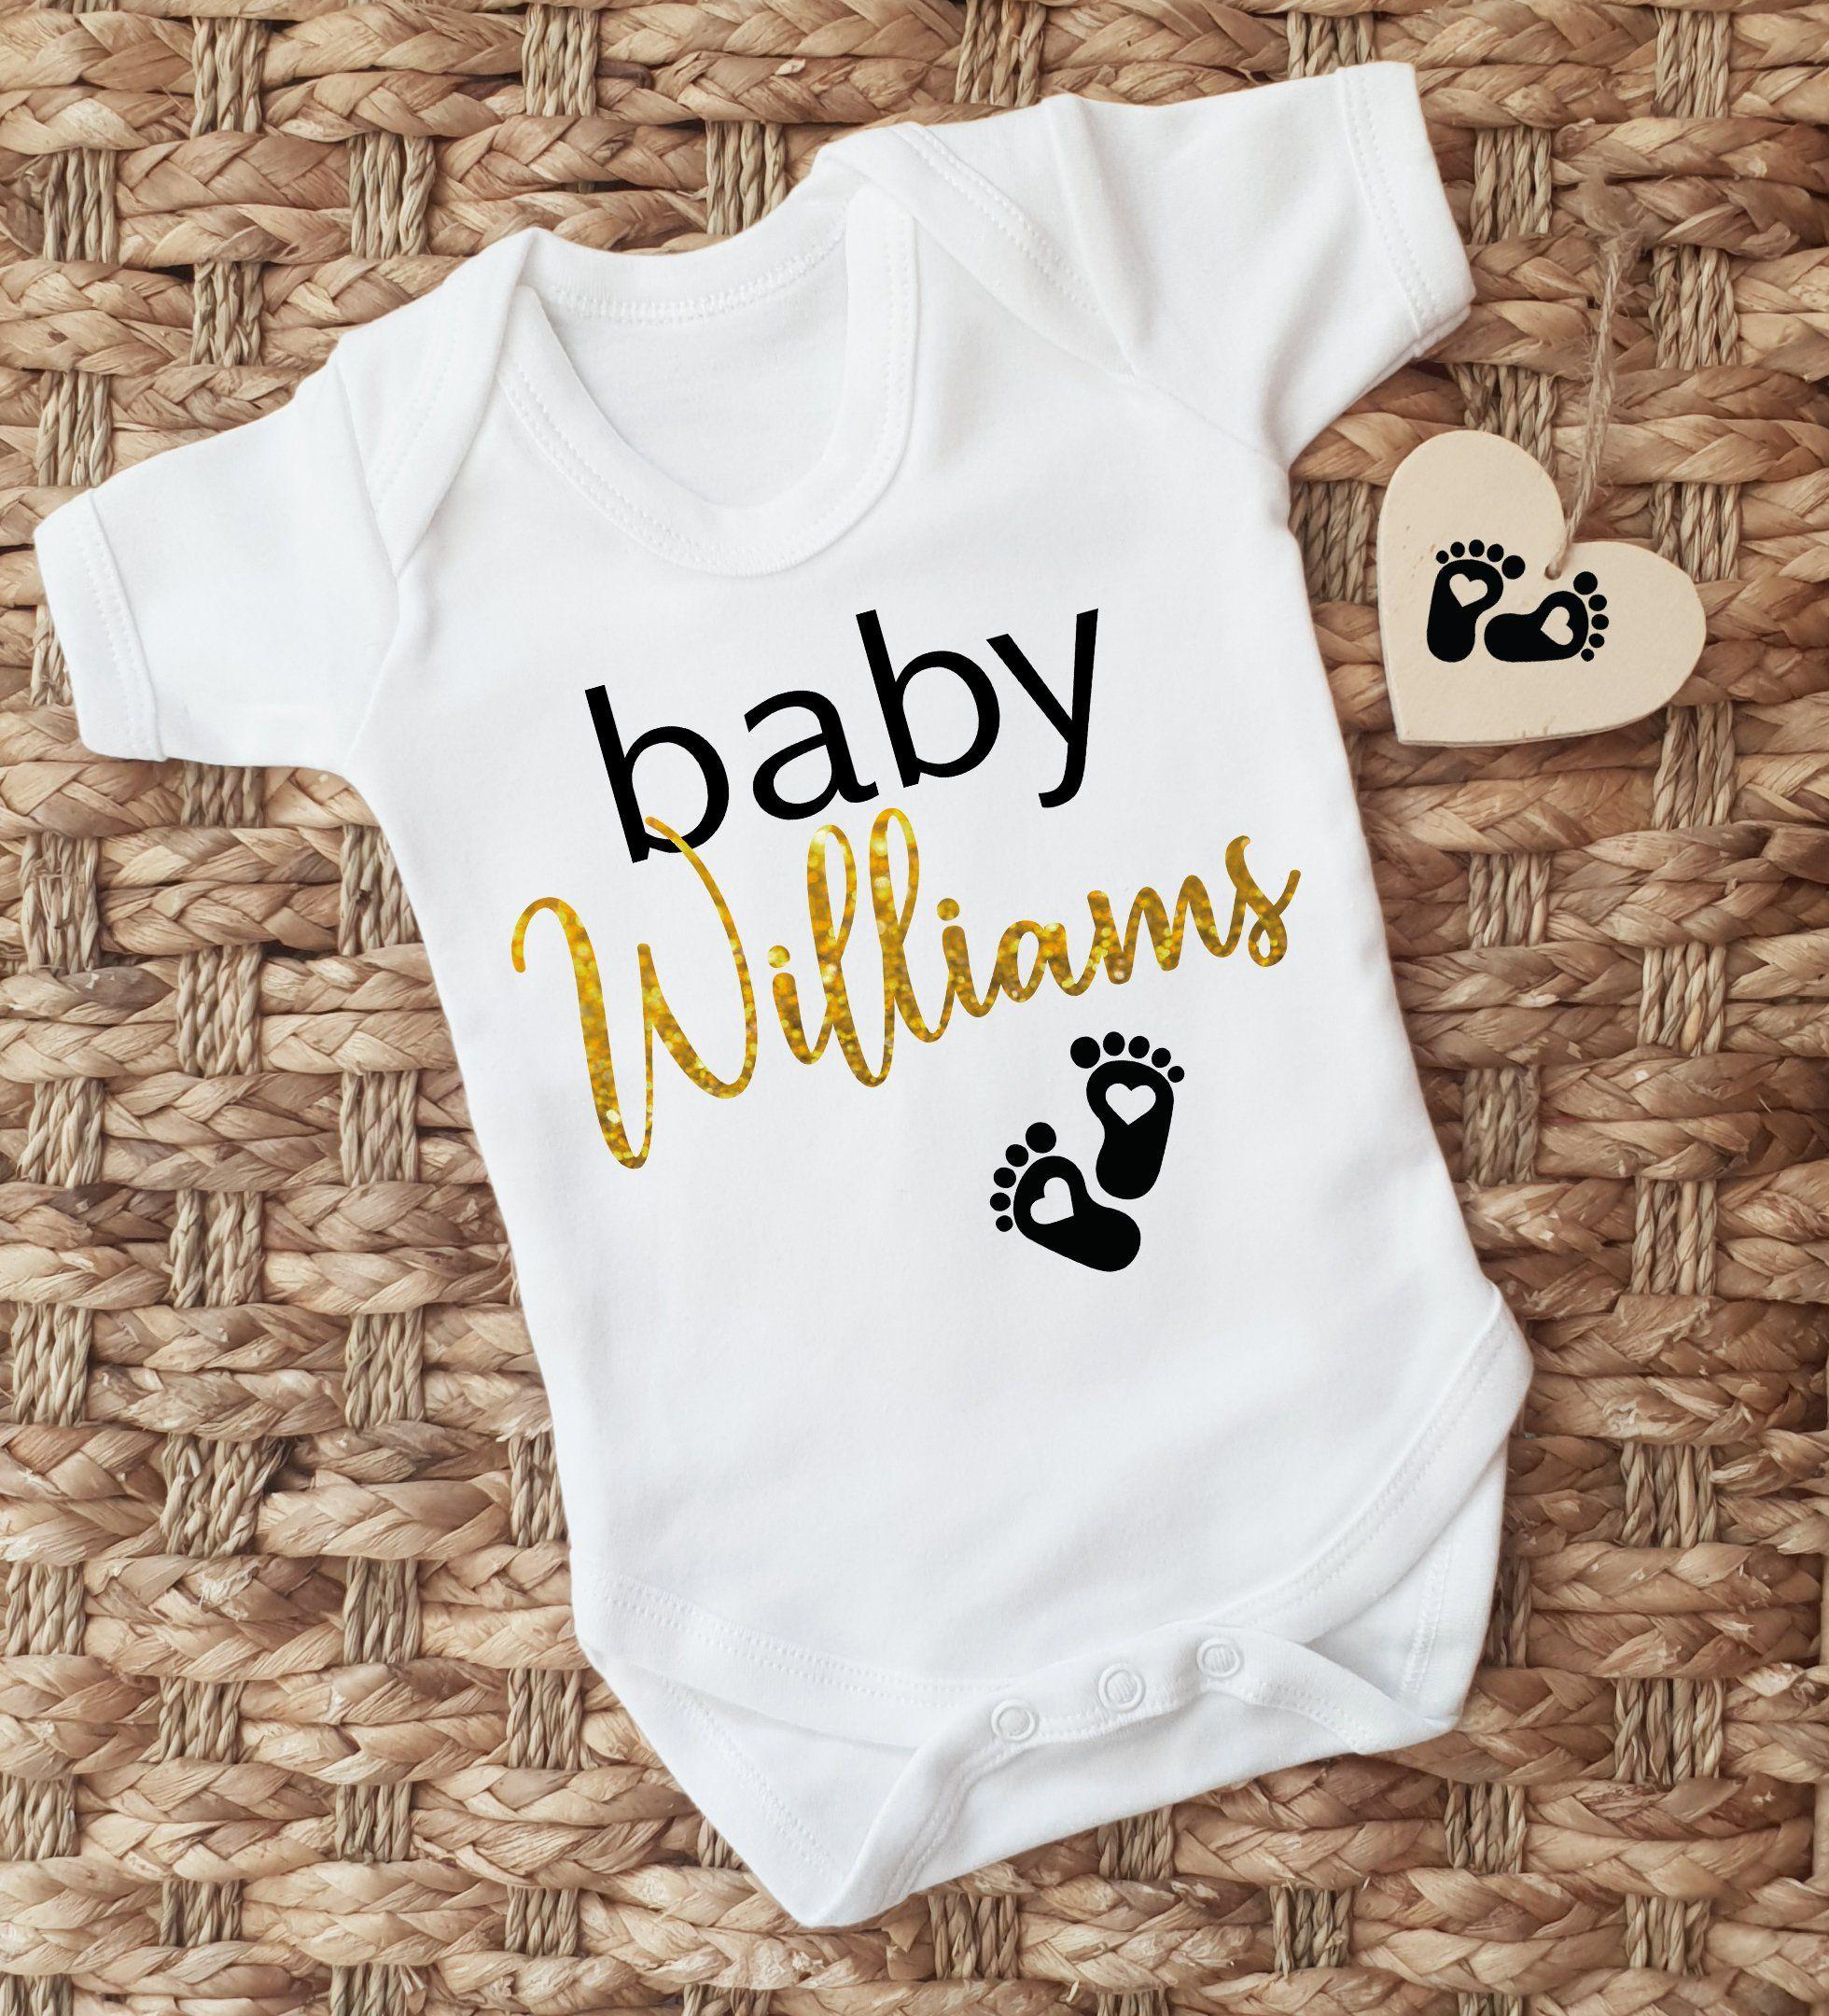 c8b82ae13 Personalised baby name short sleeve baby grow